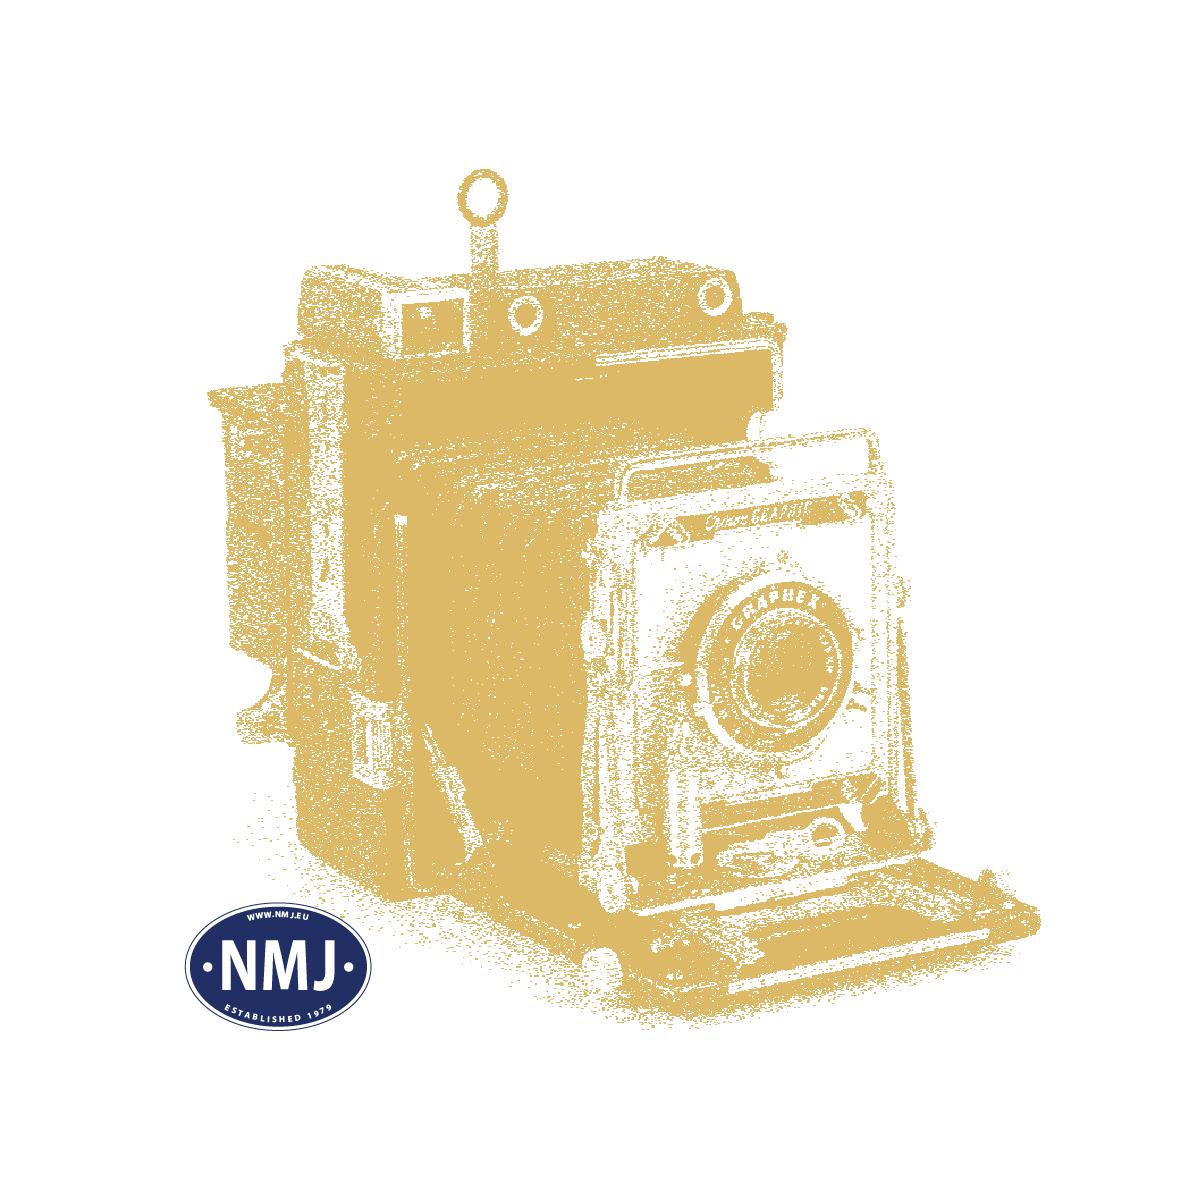 NMJT504.402 - NMJ Topline NSB His 210 2 650-9